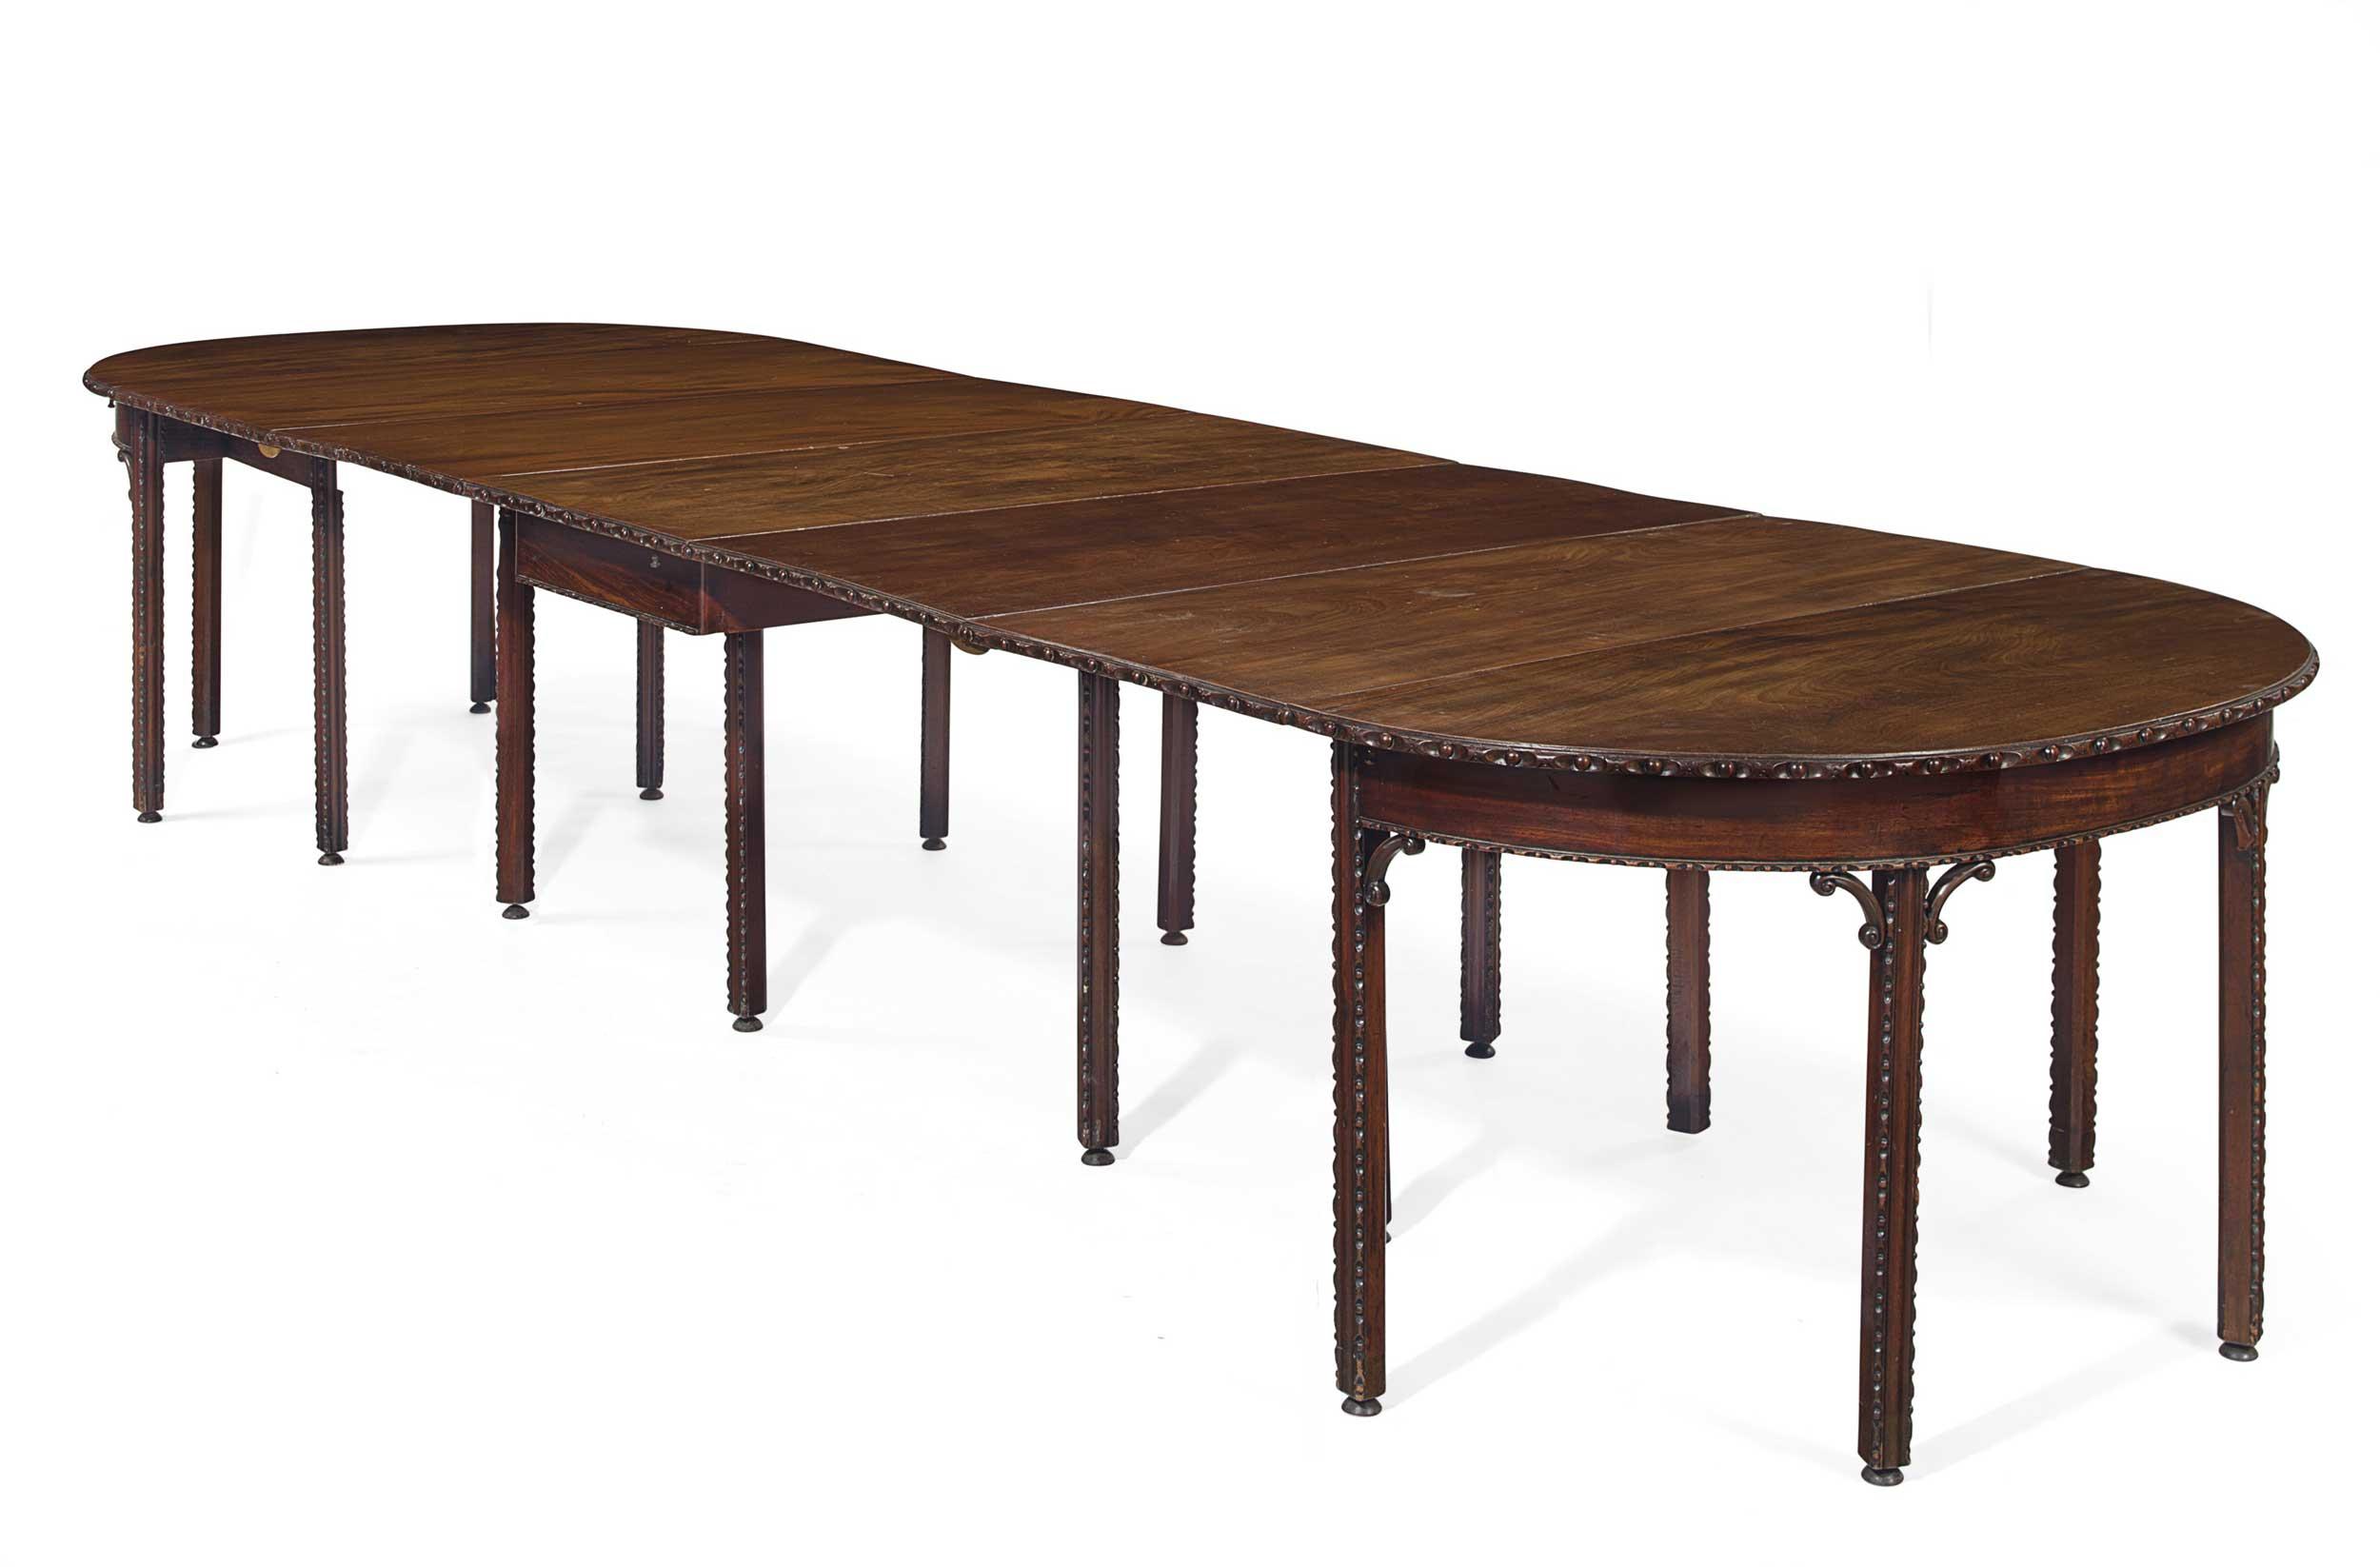 <b>An Early George III Mahogany Gate-Leg D-End Dining Table</b><br/>Circa 1760